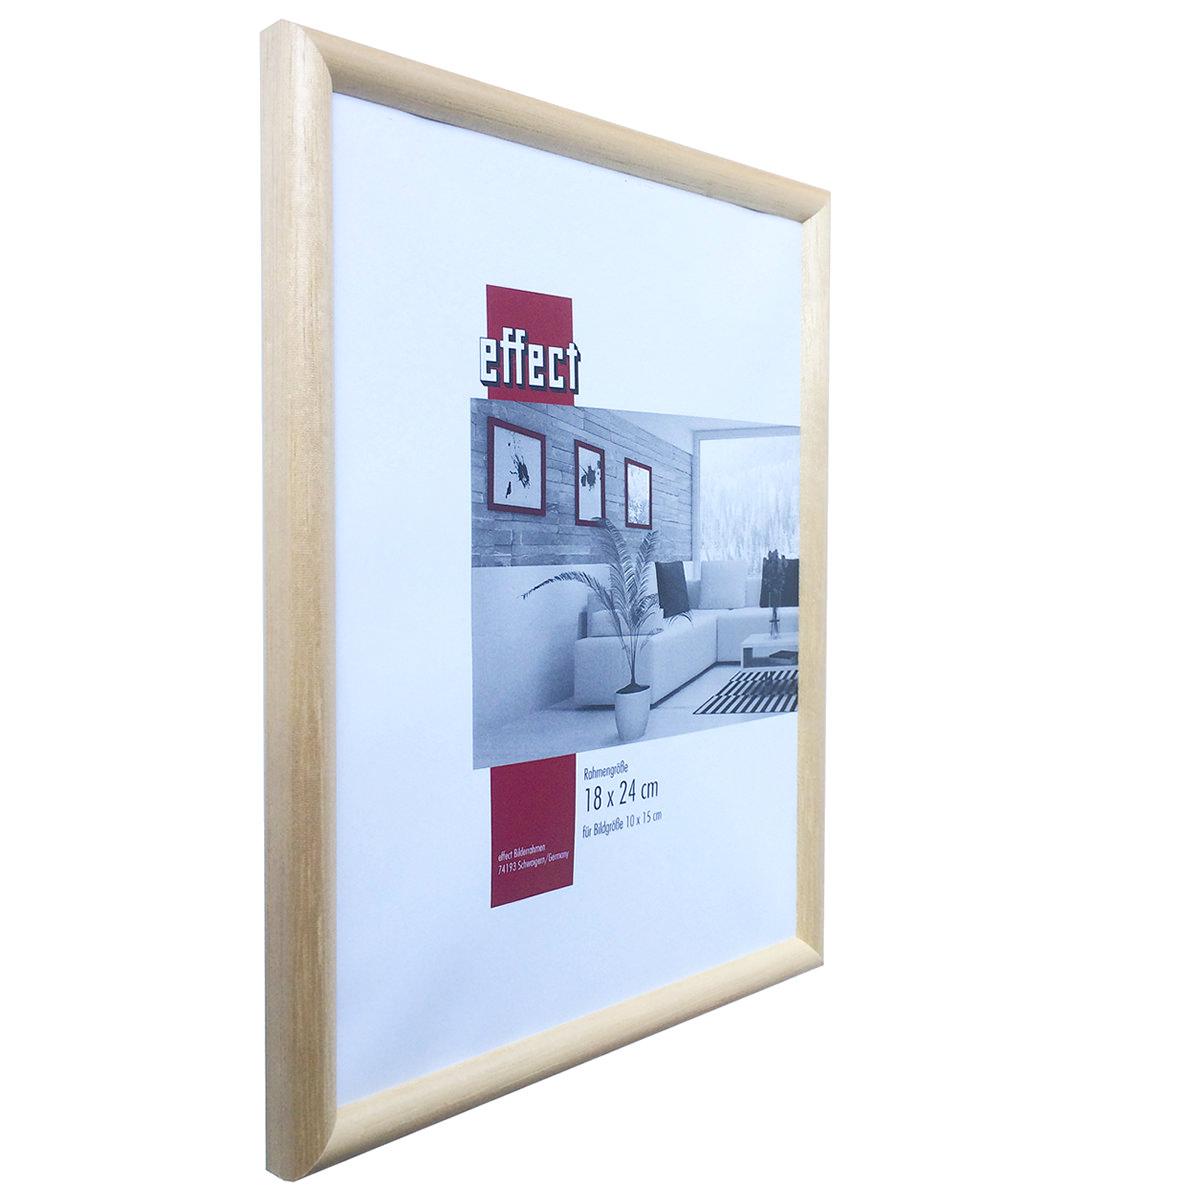 bilderrahmen f r triptychon bilder profil 20 ohne glas. Black Bedroom Furniture Sets. Home Design Ideas